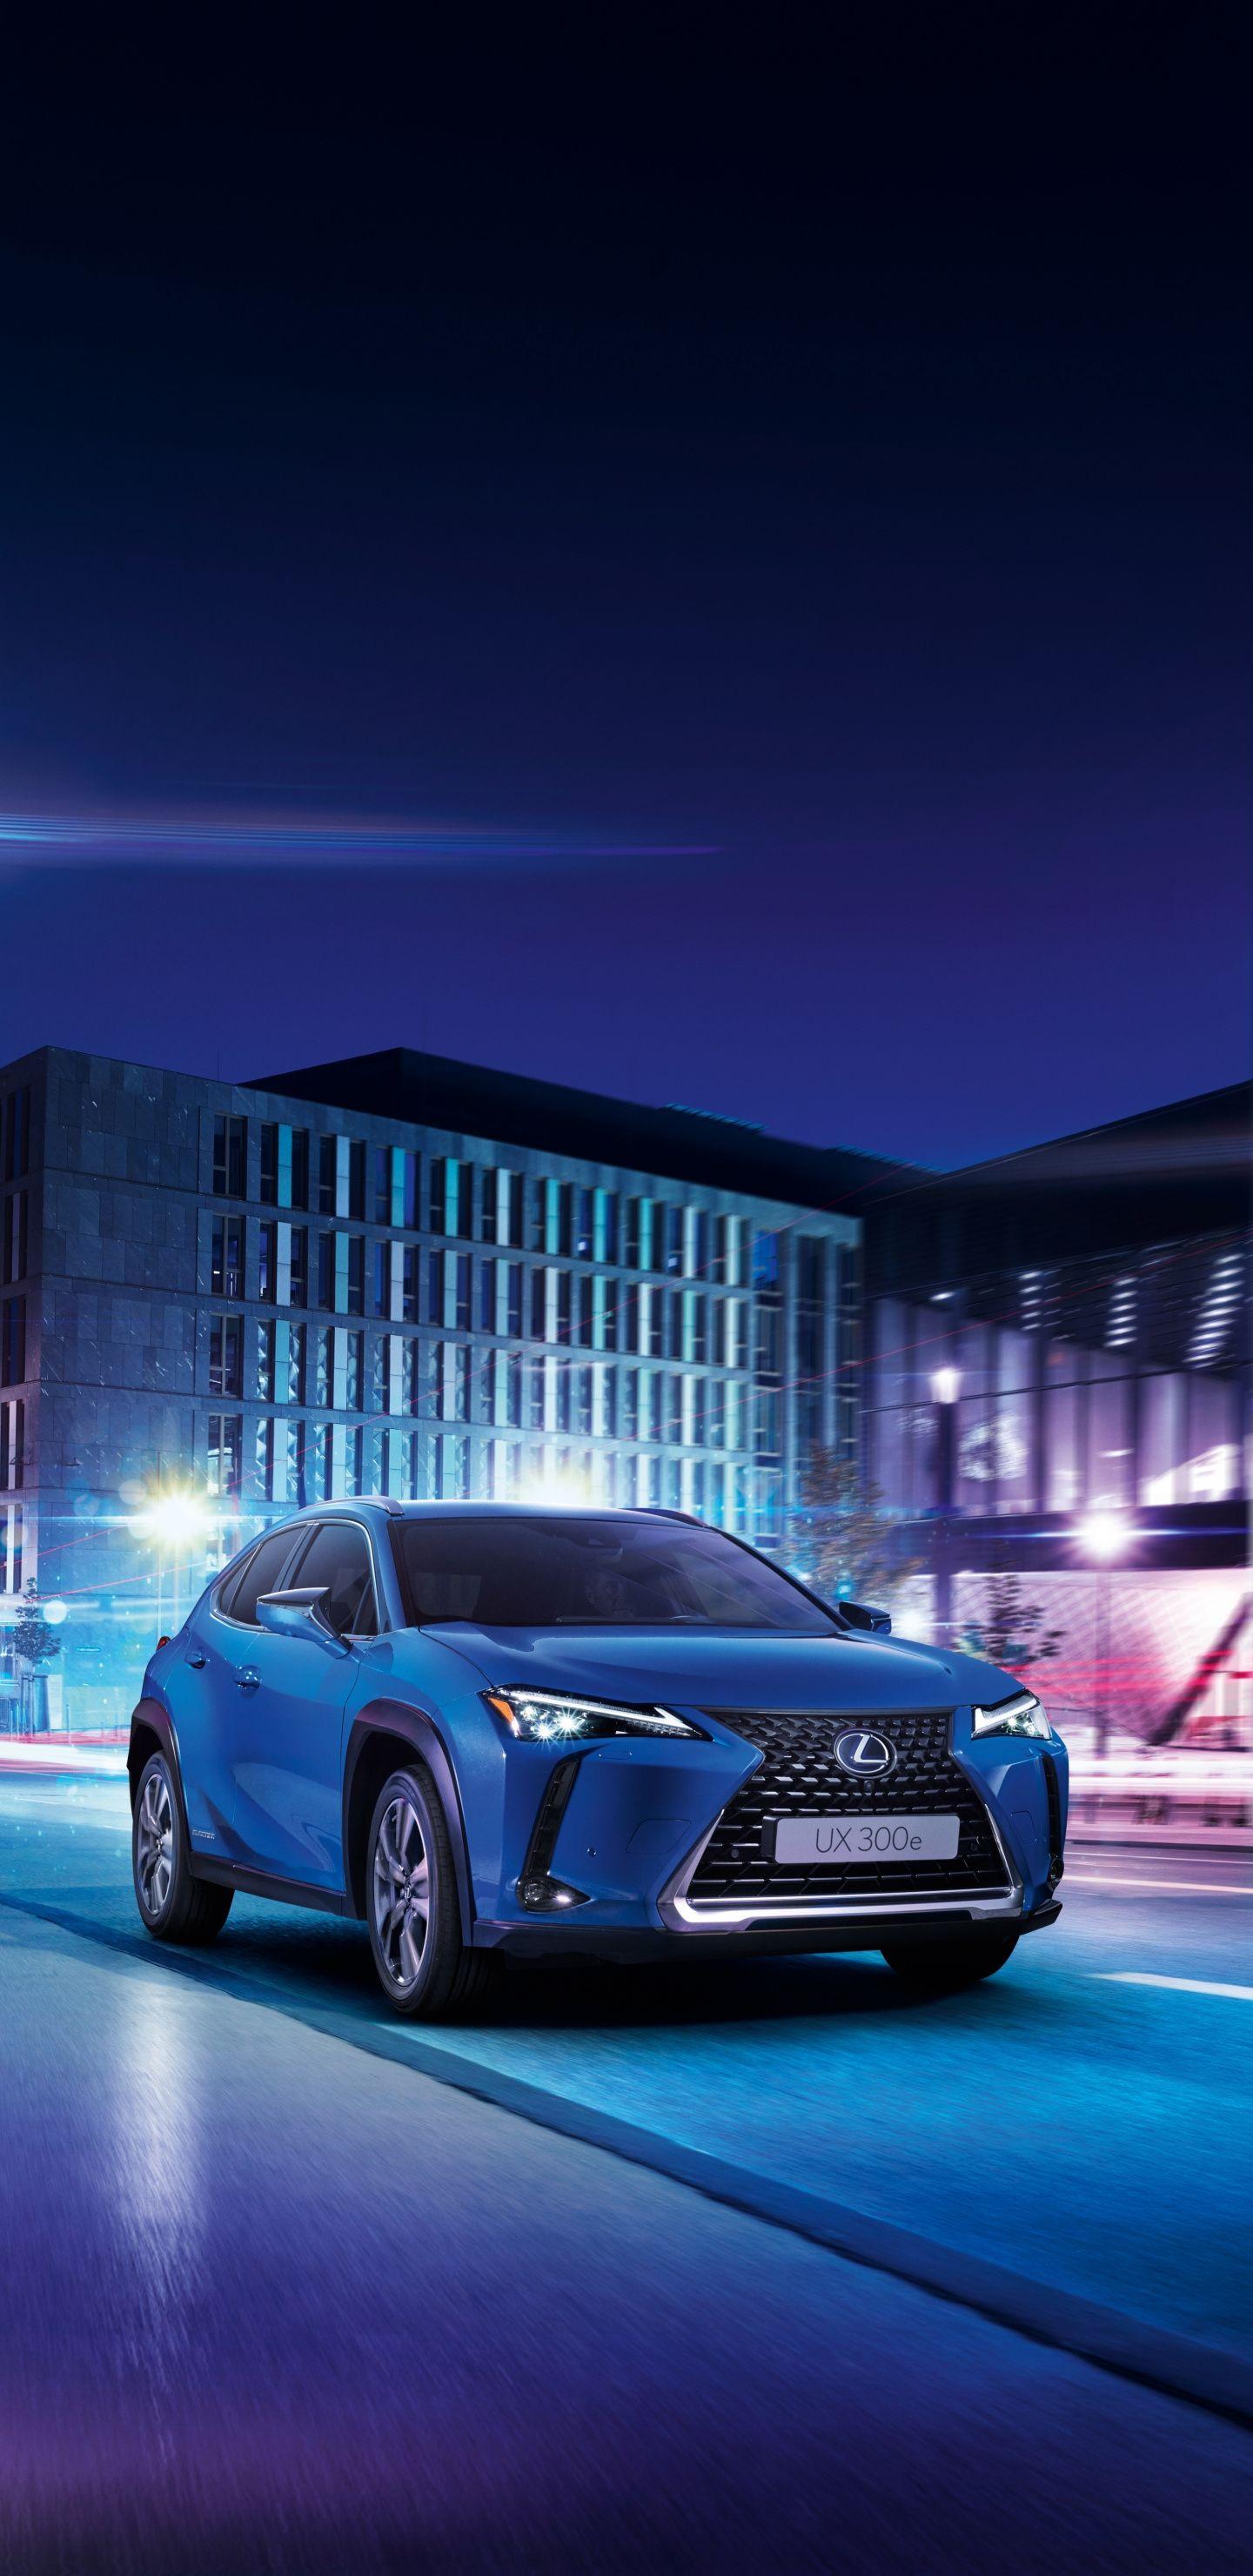 1440x2960 Blue Car 2020 Lexus Ux 300e Wallpaper Blue Car Lexus Car Wallpapers